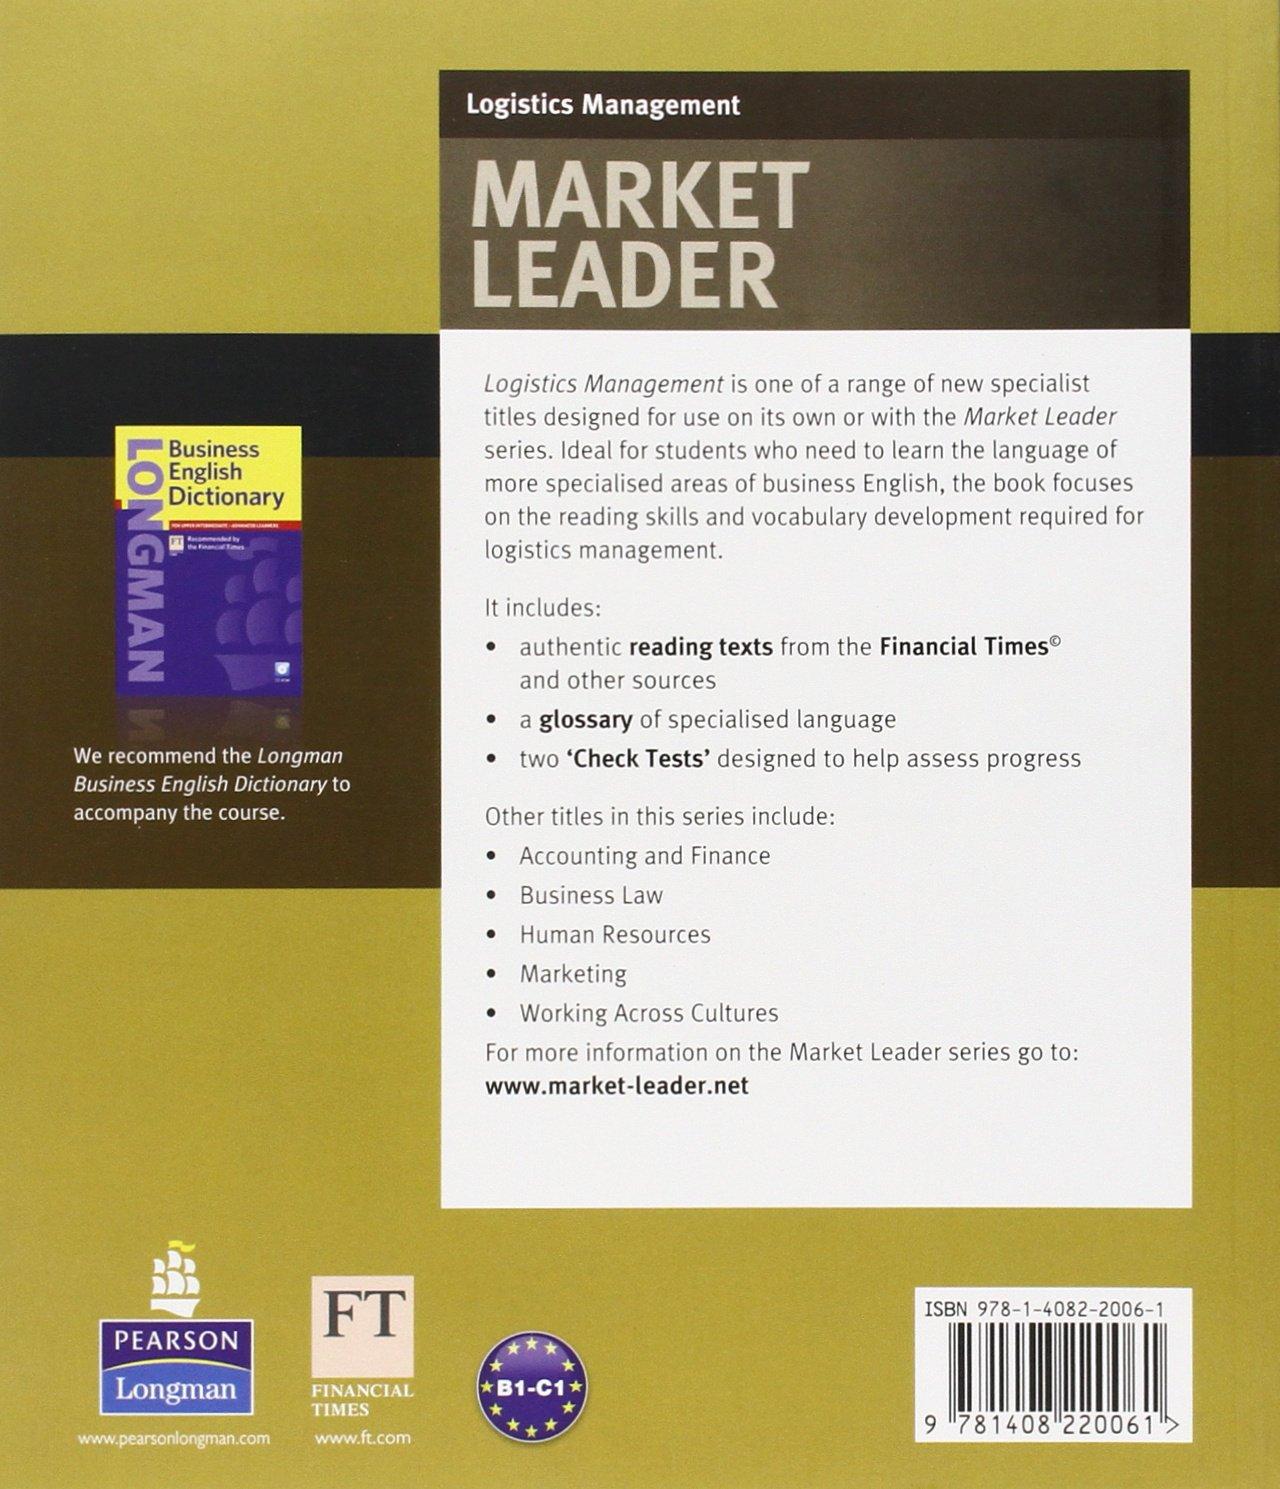 Market Leader Logistics Management ESP Book Business English ...